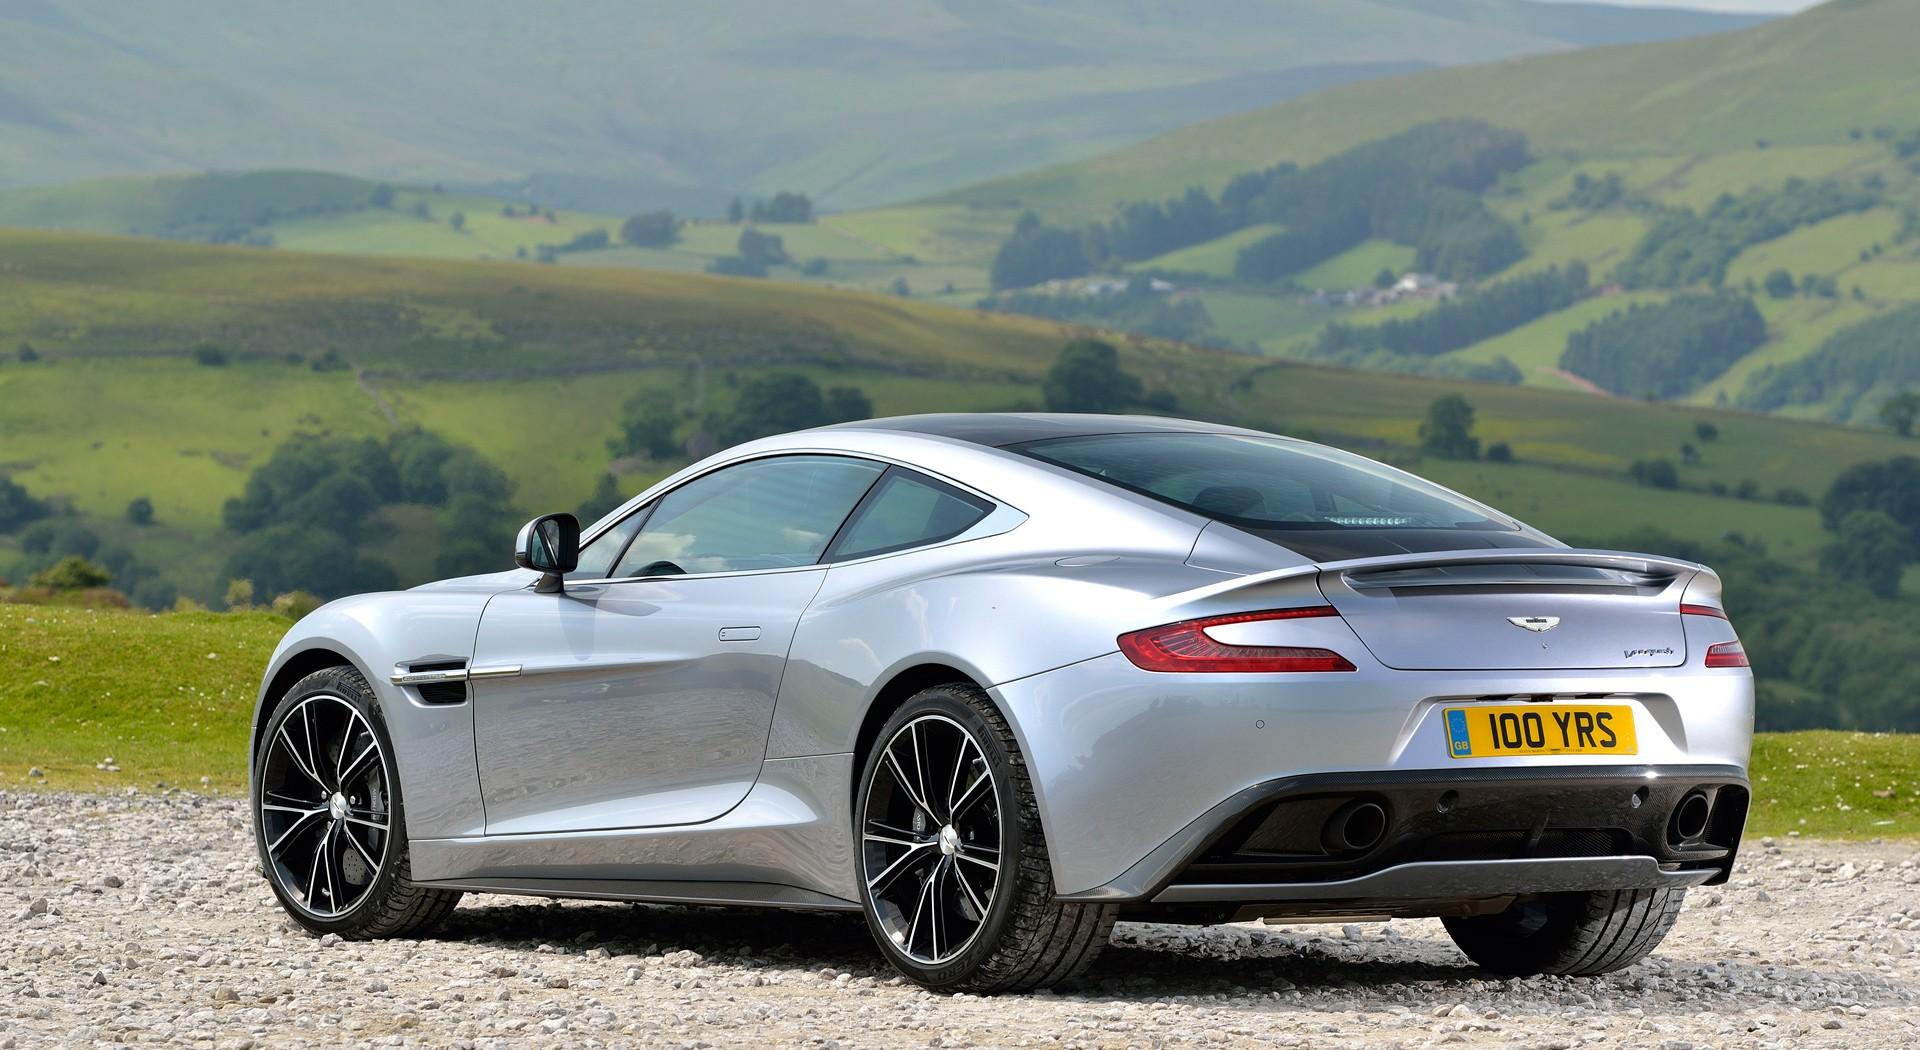 Aston Martin Vanquish rear